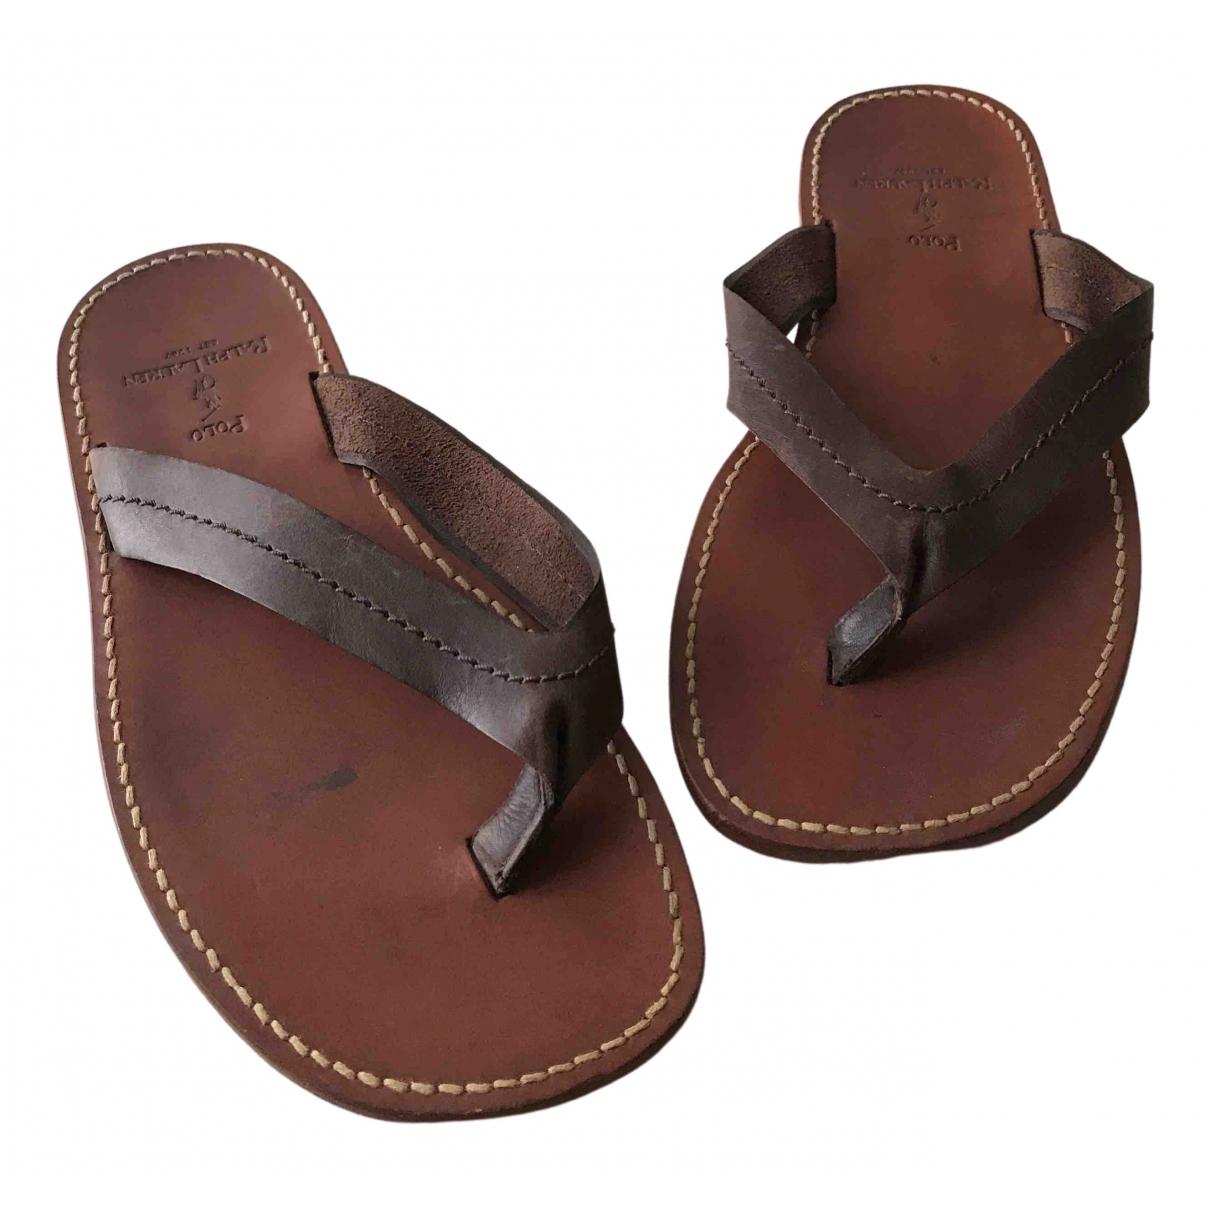 Polo Ralph Lauren \N Brown Leather Sandals for Men 43 EU